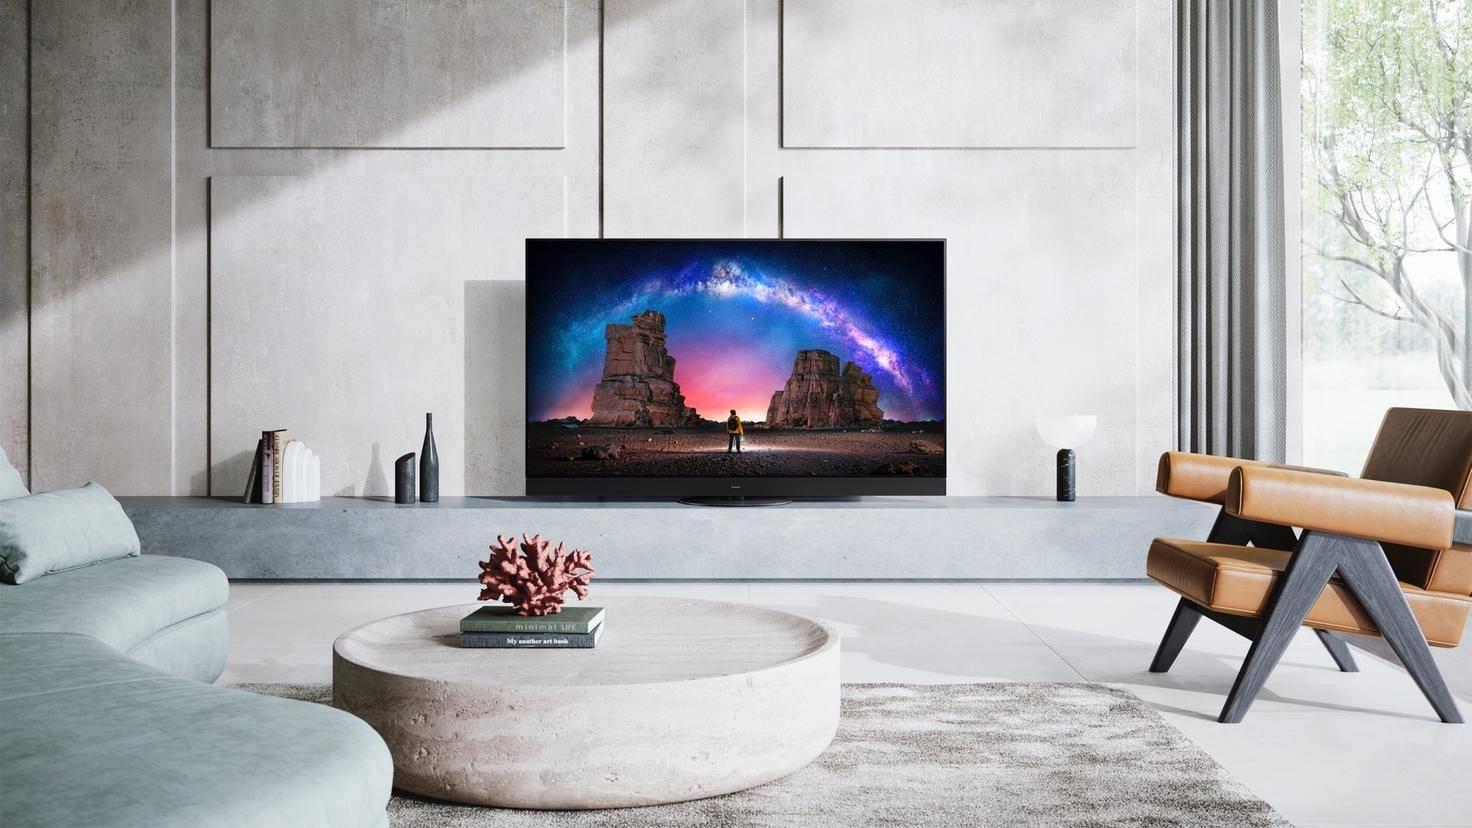 052-FY2020_Panasonic-TV-JZW2004-CES_living-room